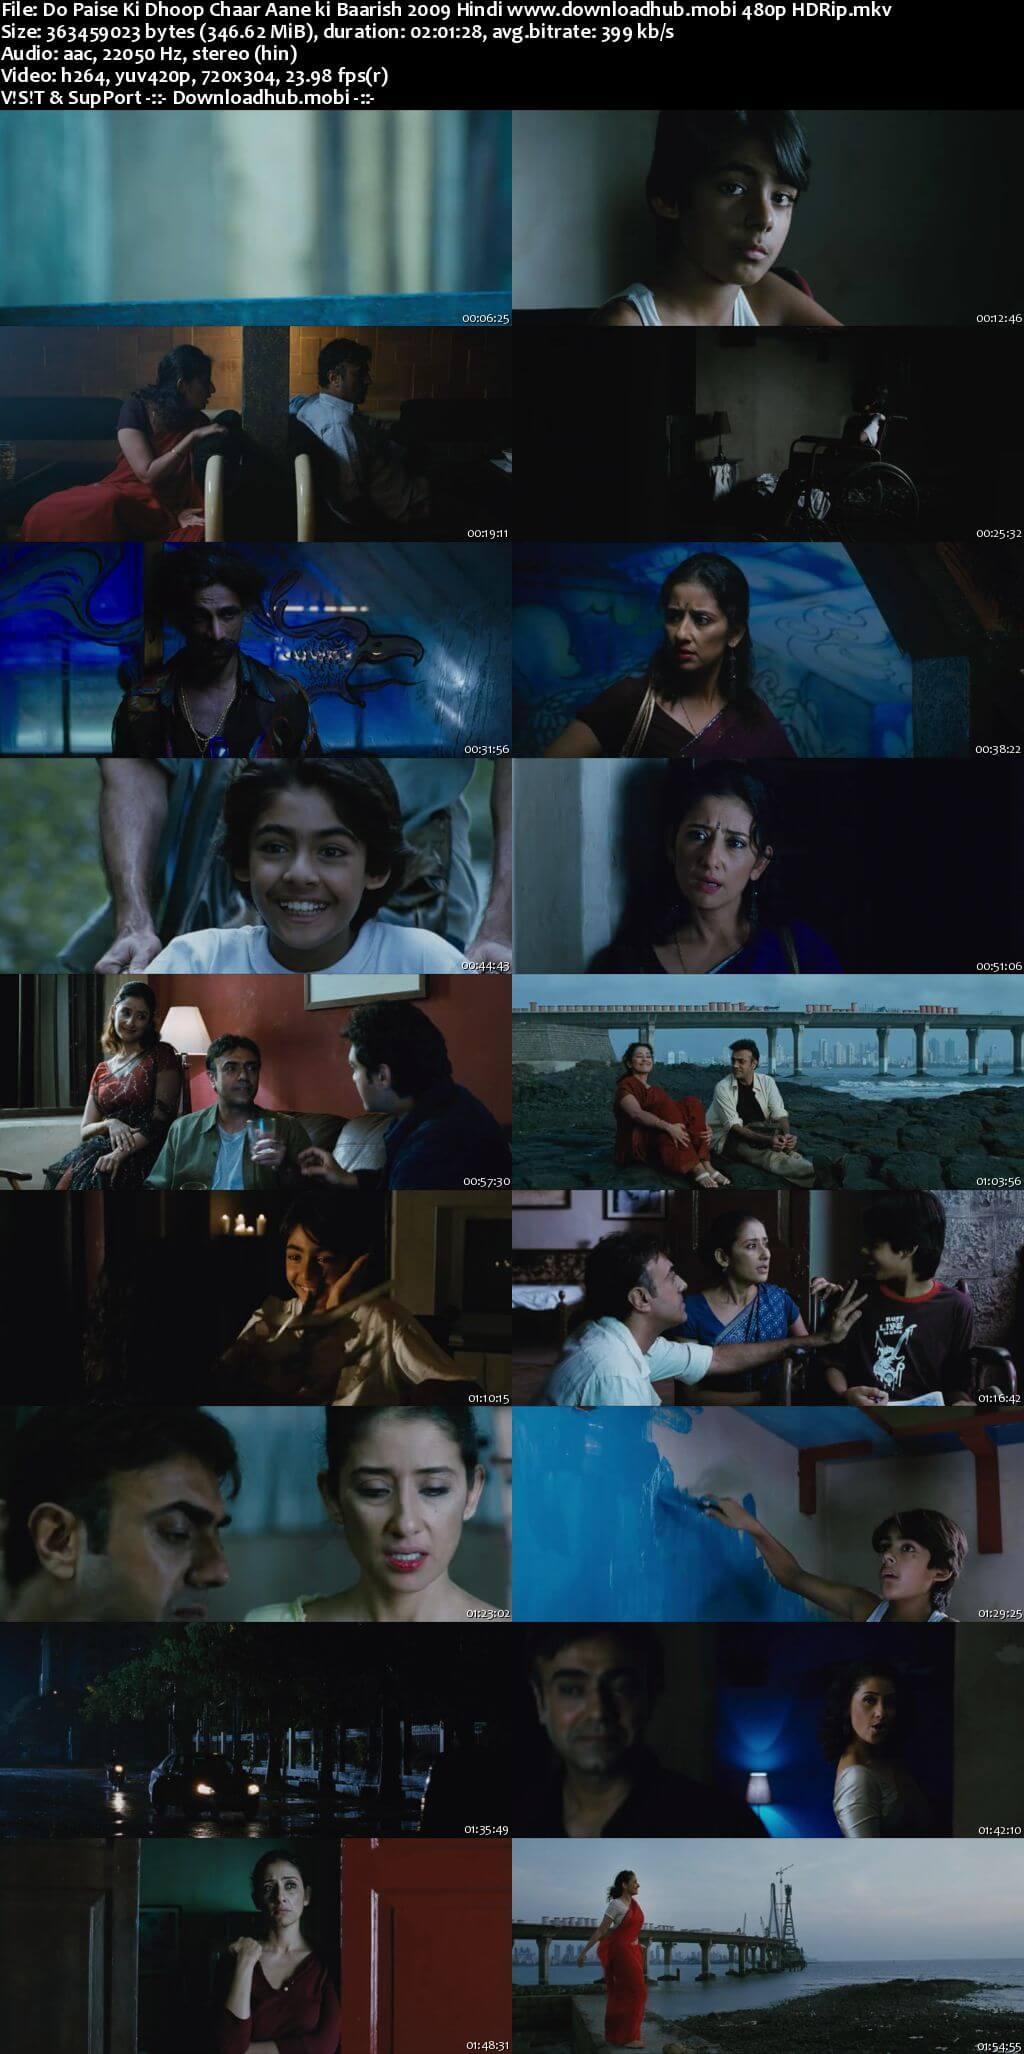 Do Paise Ki Dhoop Chaar Aane Ki Baarish 2009 Hindi 350MB HDRip 480p